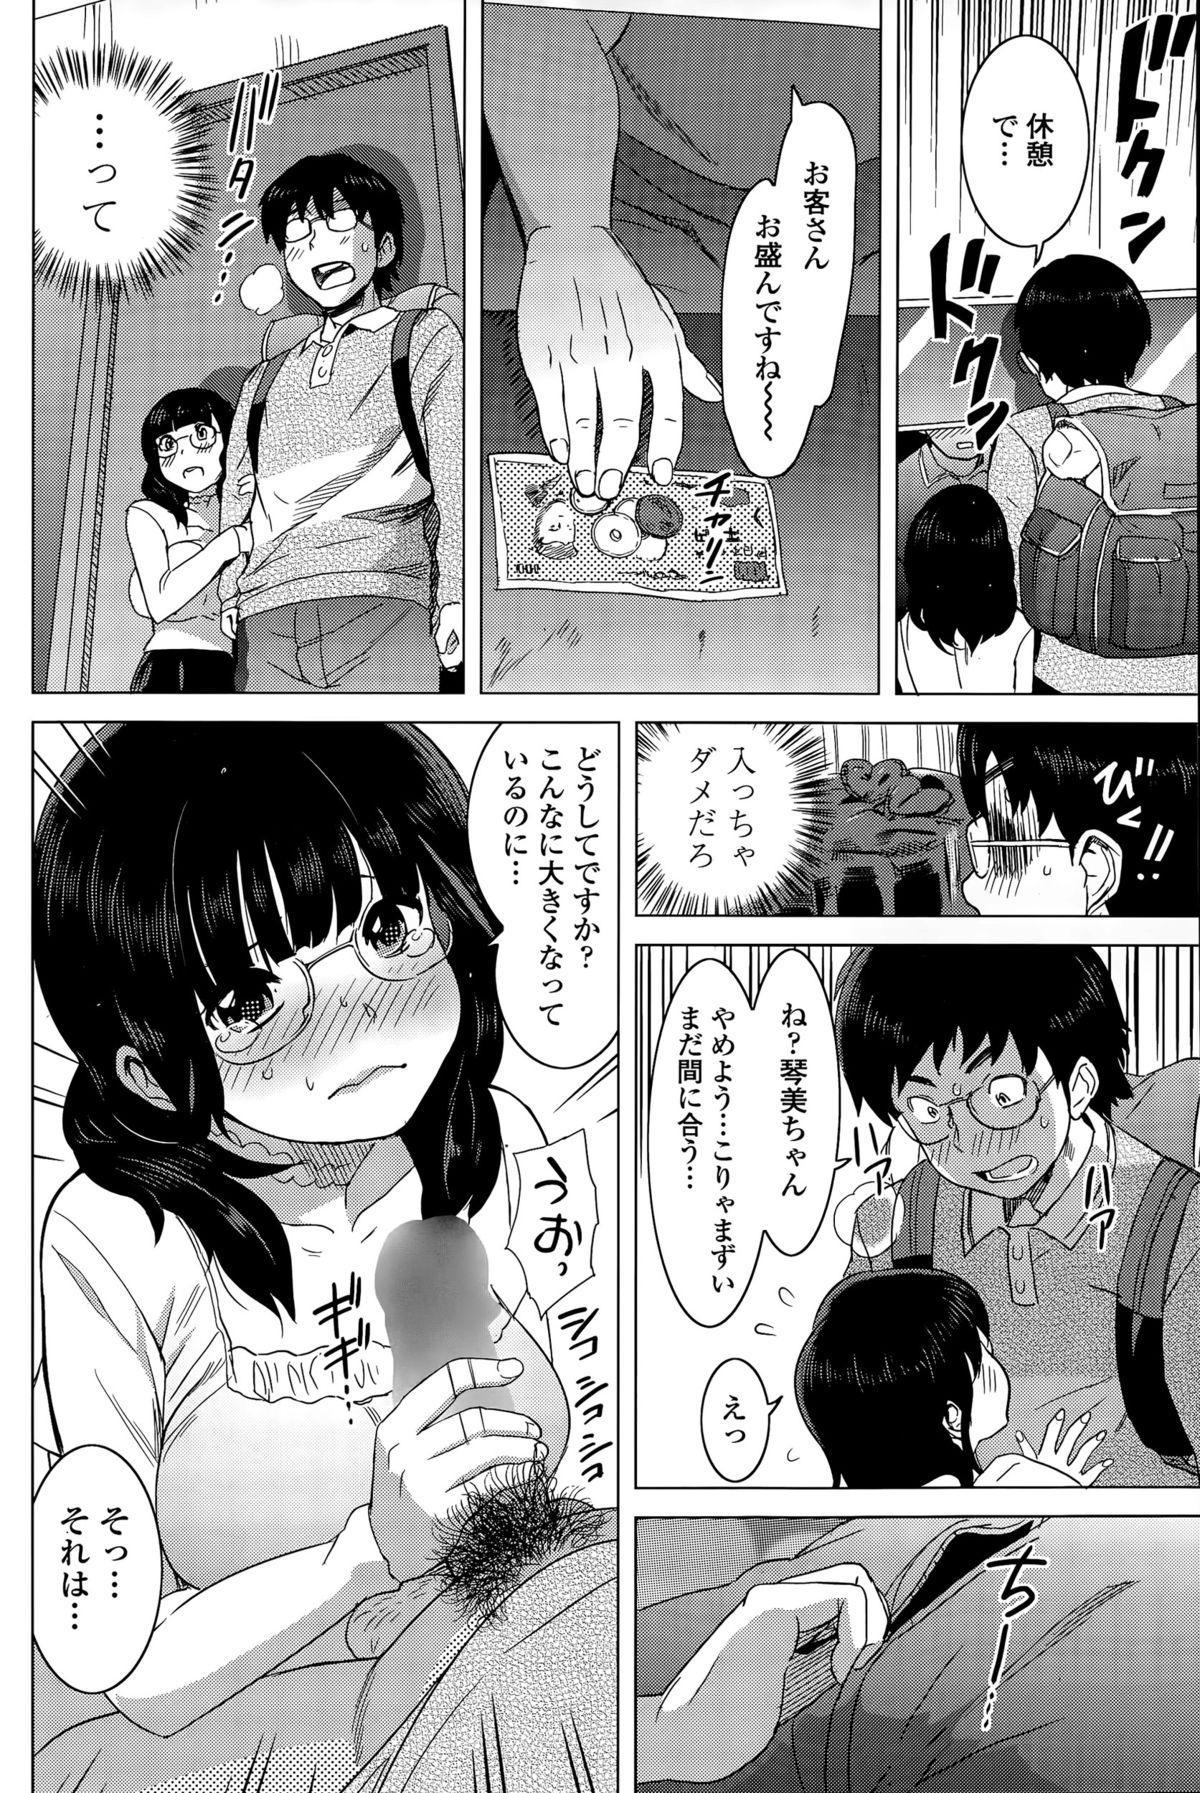 Milk Cafe Ch. 1-3 43